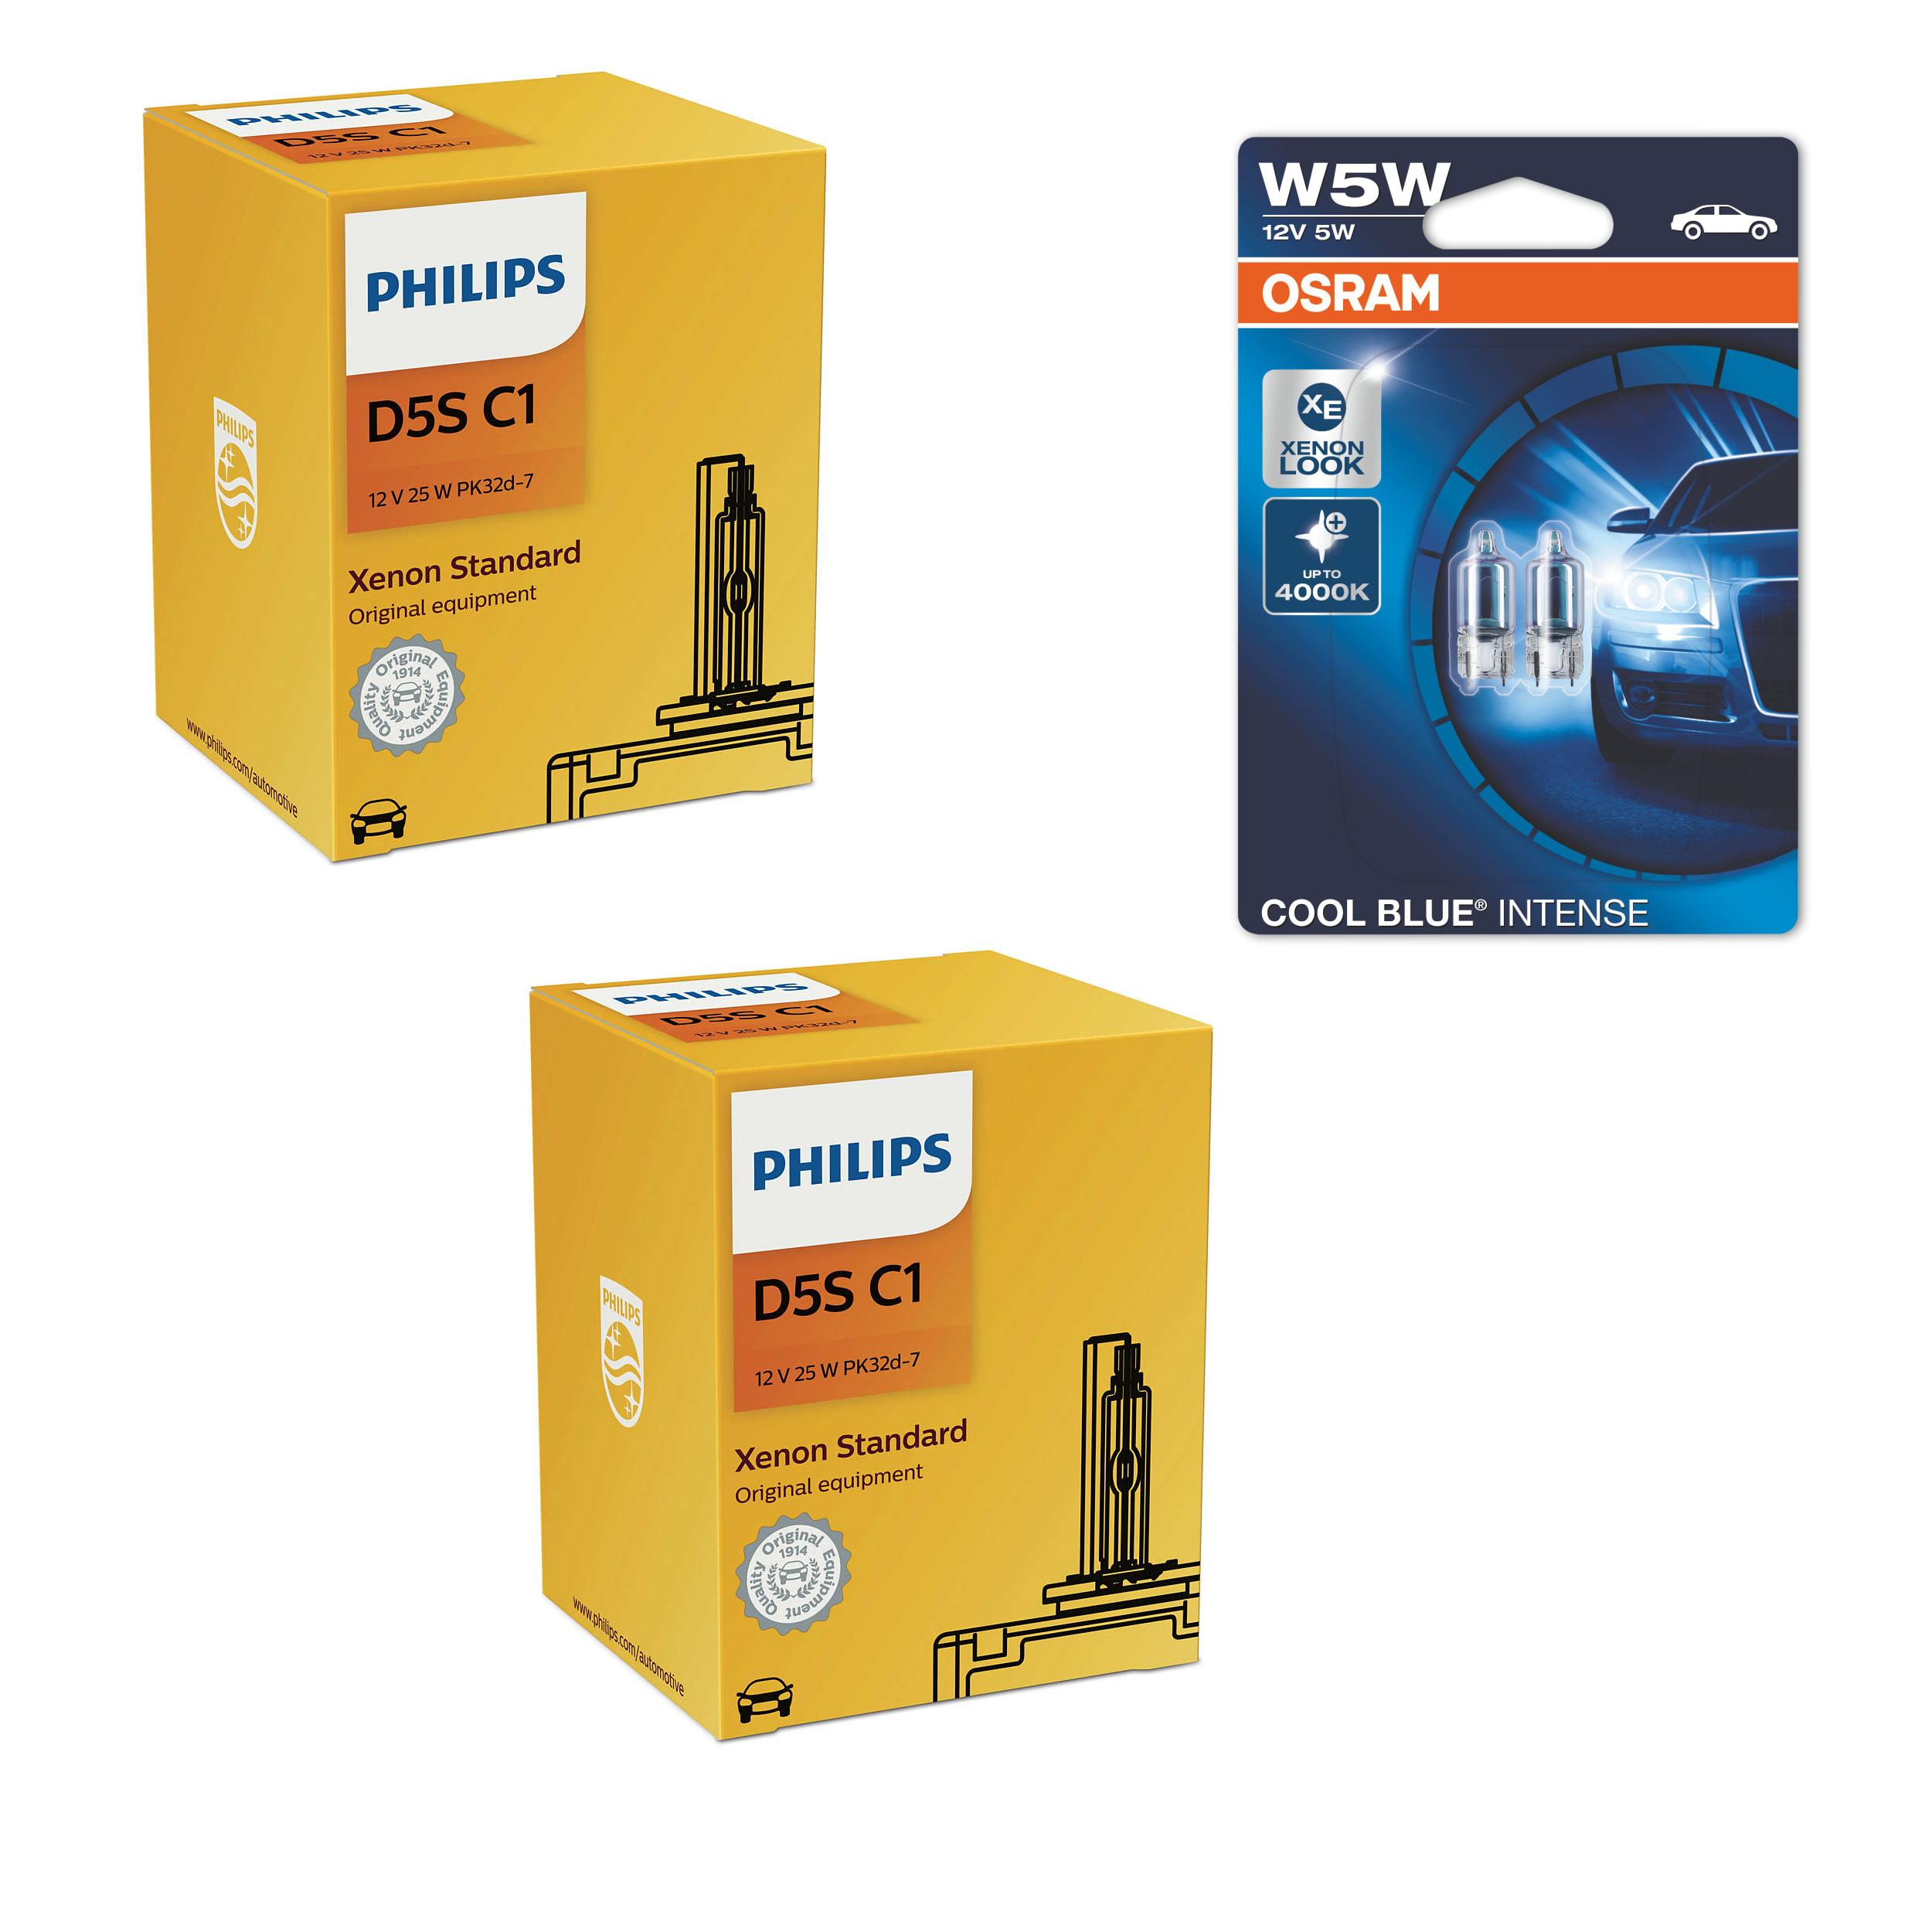 D5S-12V-25W-Vision-Xenon-Brenner-4600K-2St-Philips-W5W-Cool-Blue-Intense